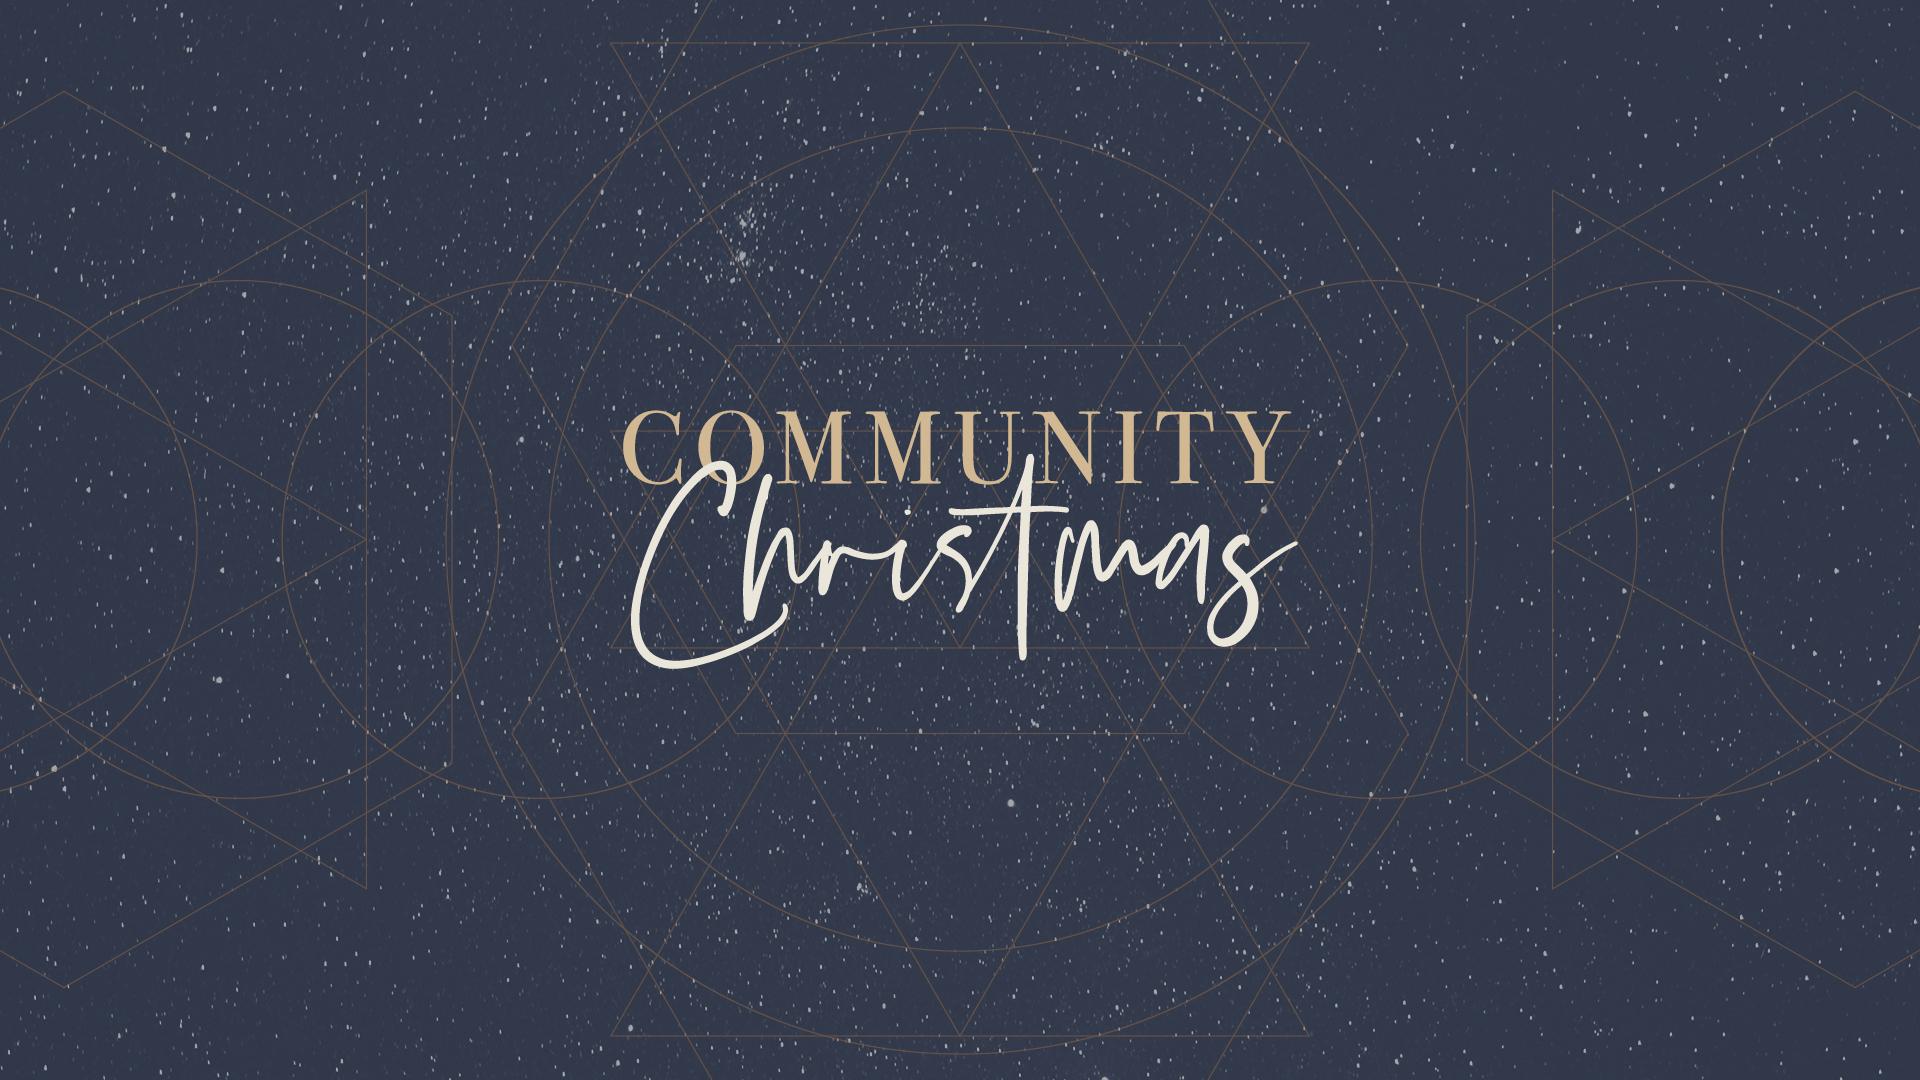 Community Christmas.jpg